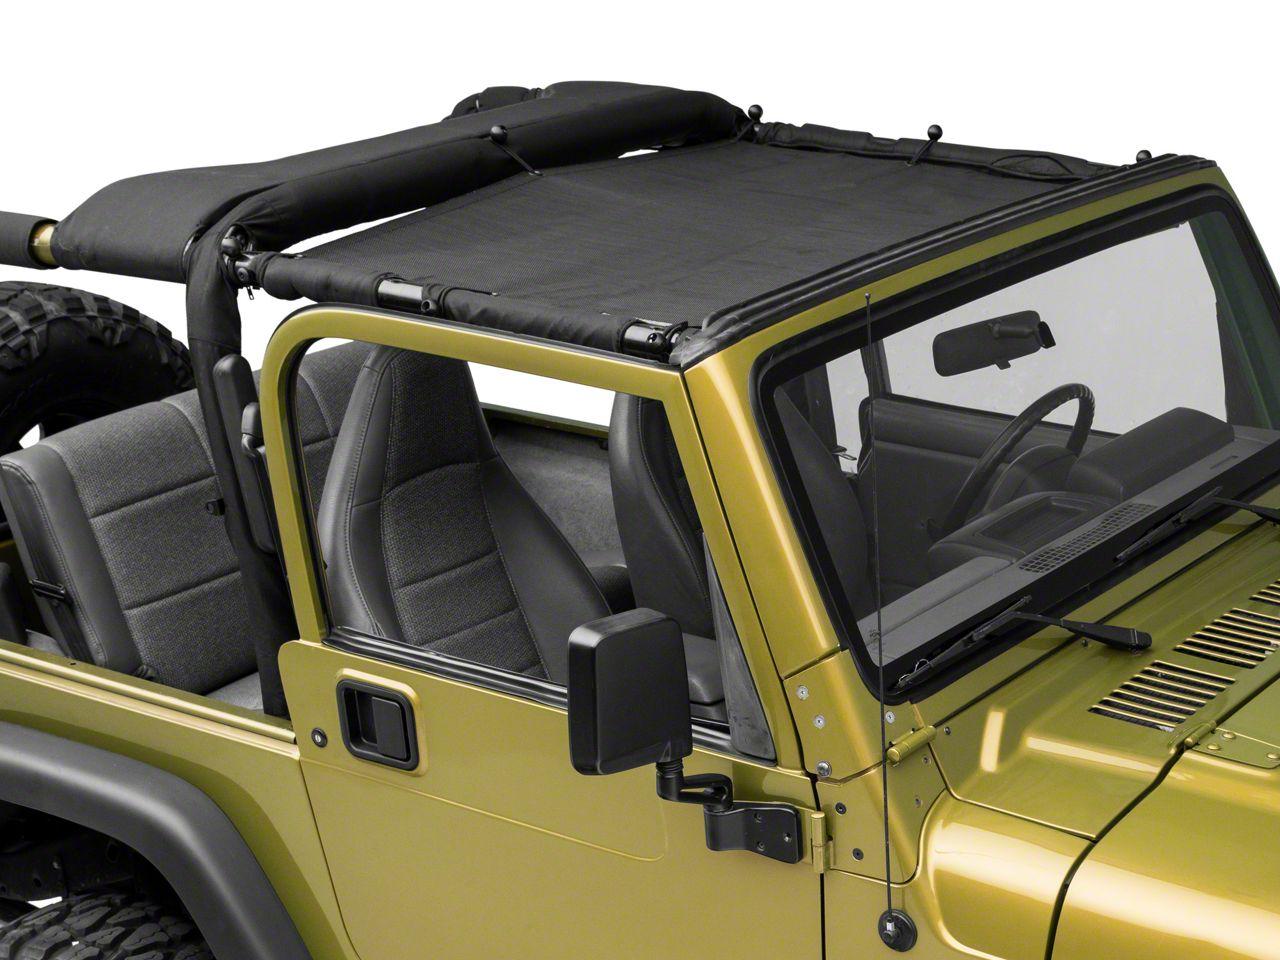 SpiderWeb Shade TJini Trail Mesh Bikini Top - Black (97-06 Jeep Wrangler TJ)